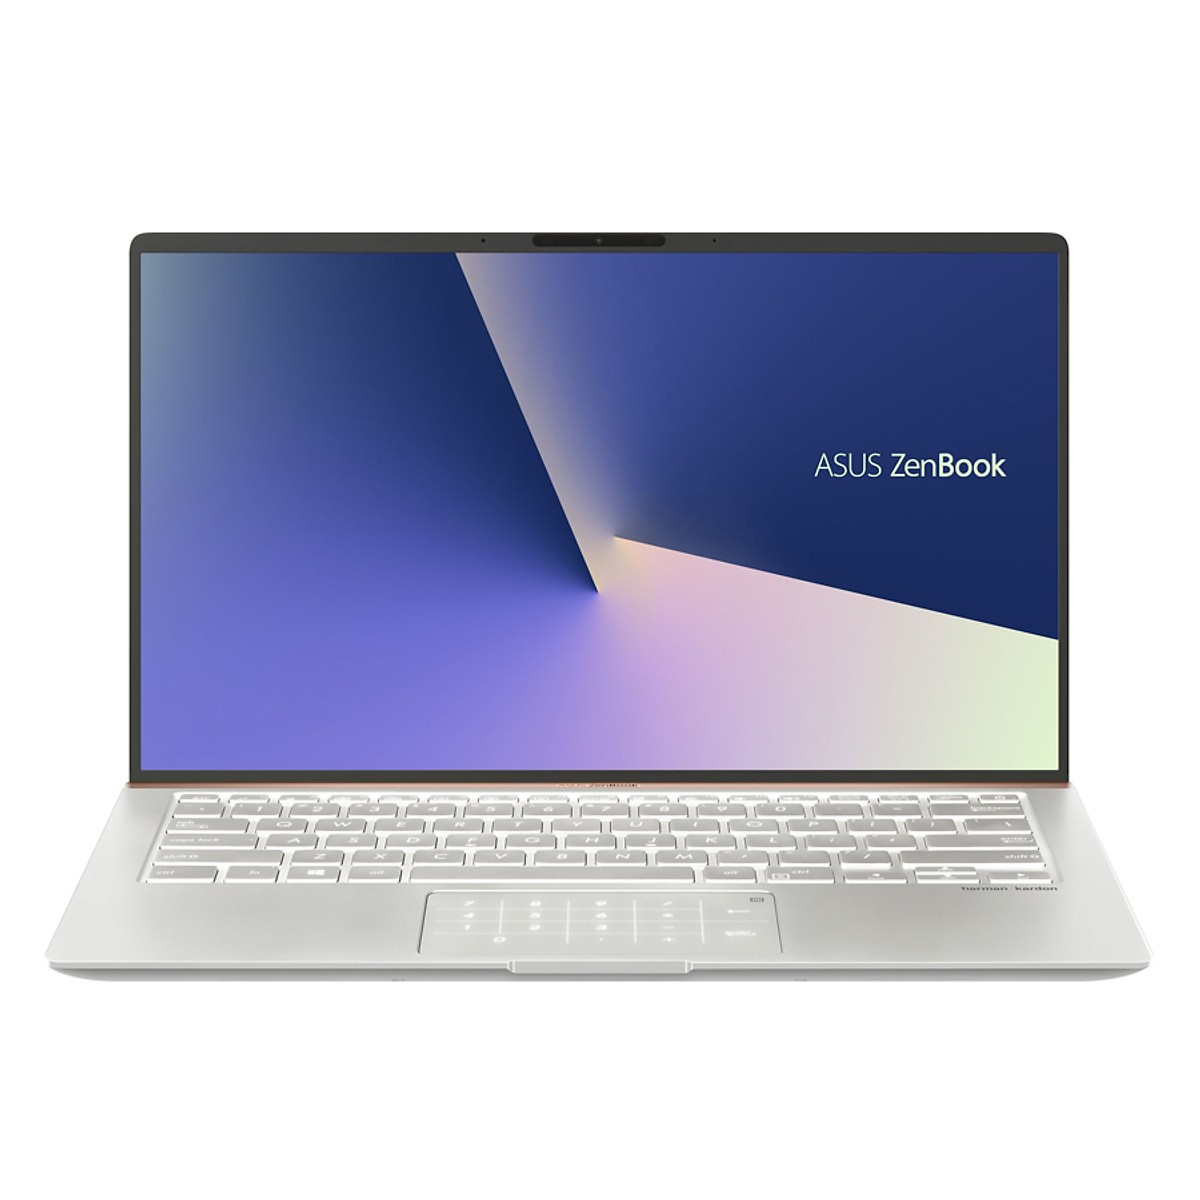 Asus   Máy tính xách tay - Laptop   Laptop Asus Zenbook 14 UX433FA-A6113T Core i5-8265U/ Win10/ Nump